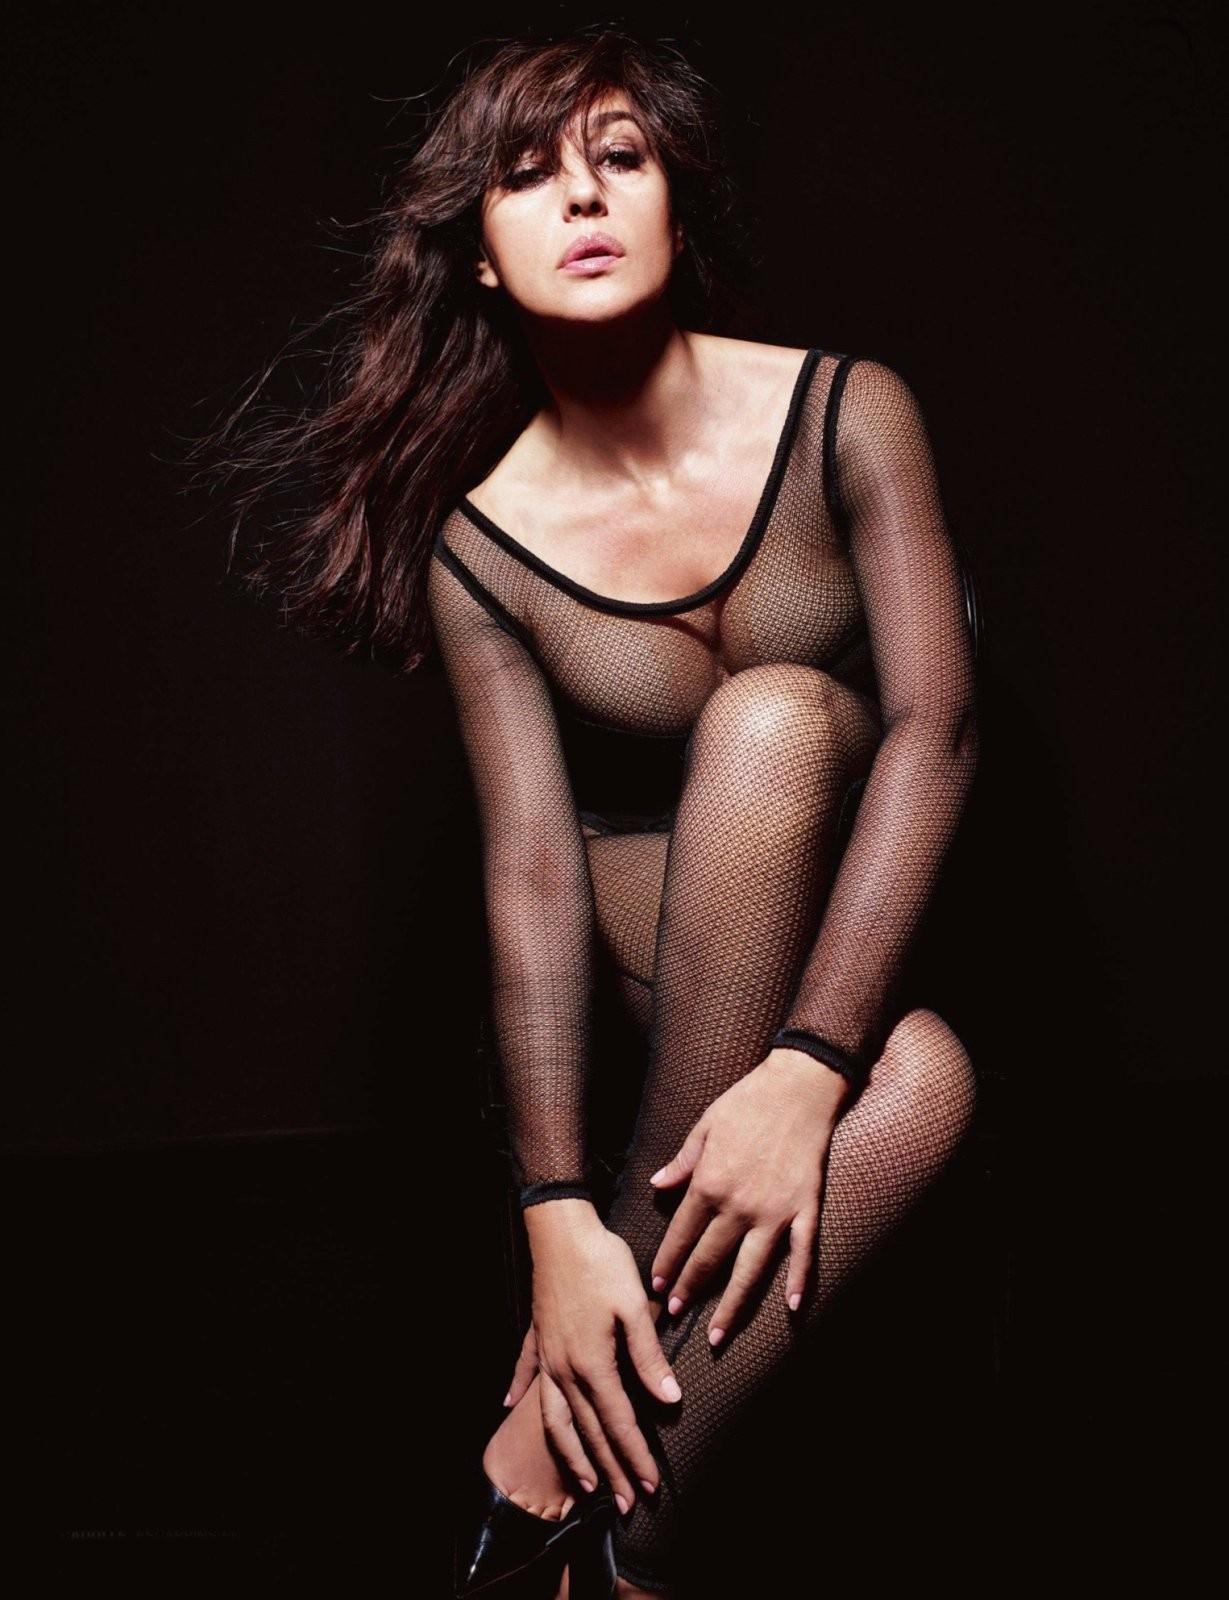 fotos Monica Bellucci desnuda